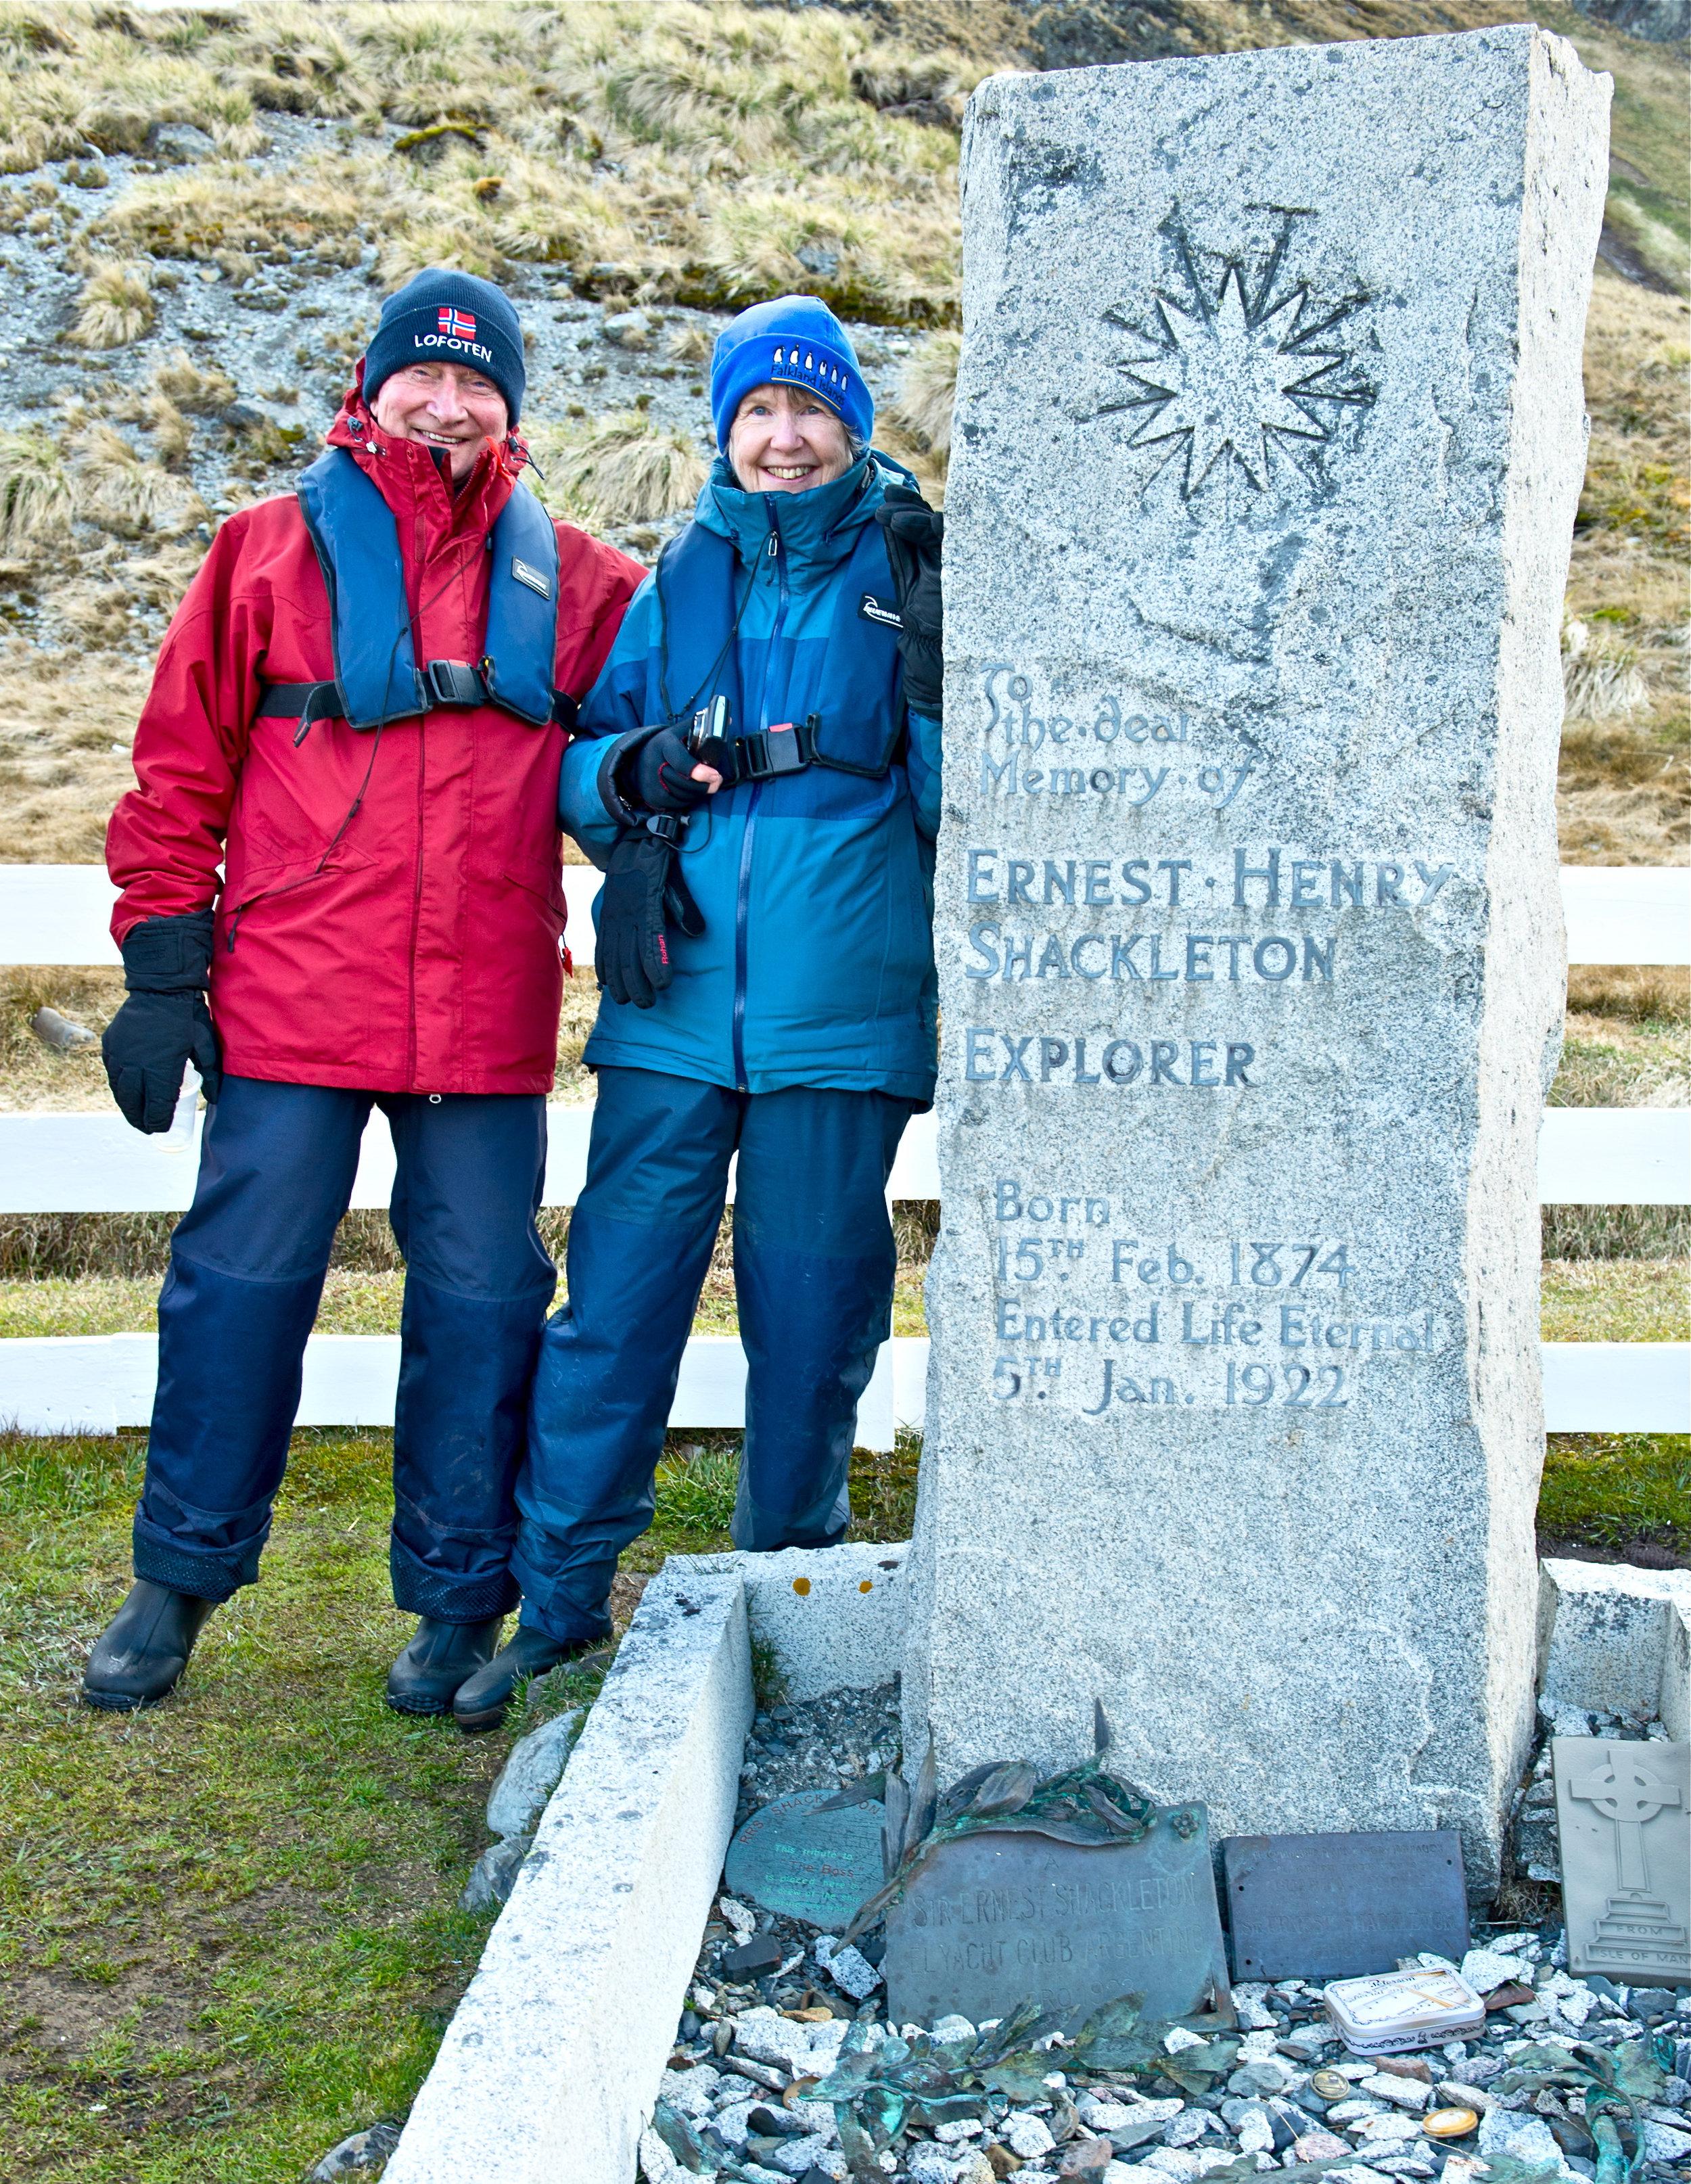 Copy of Shackleton's remains